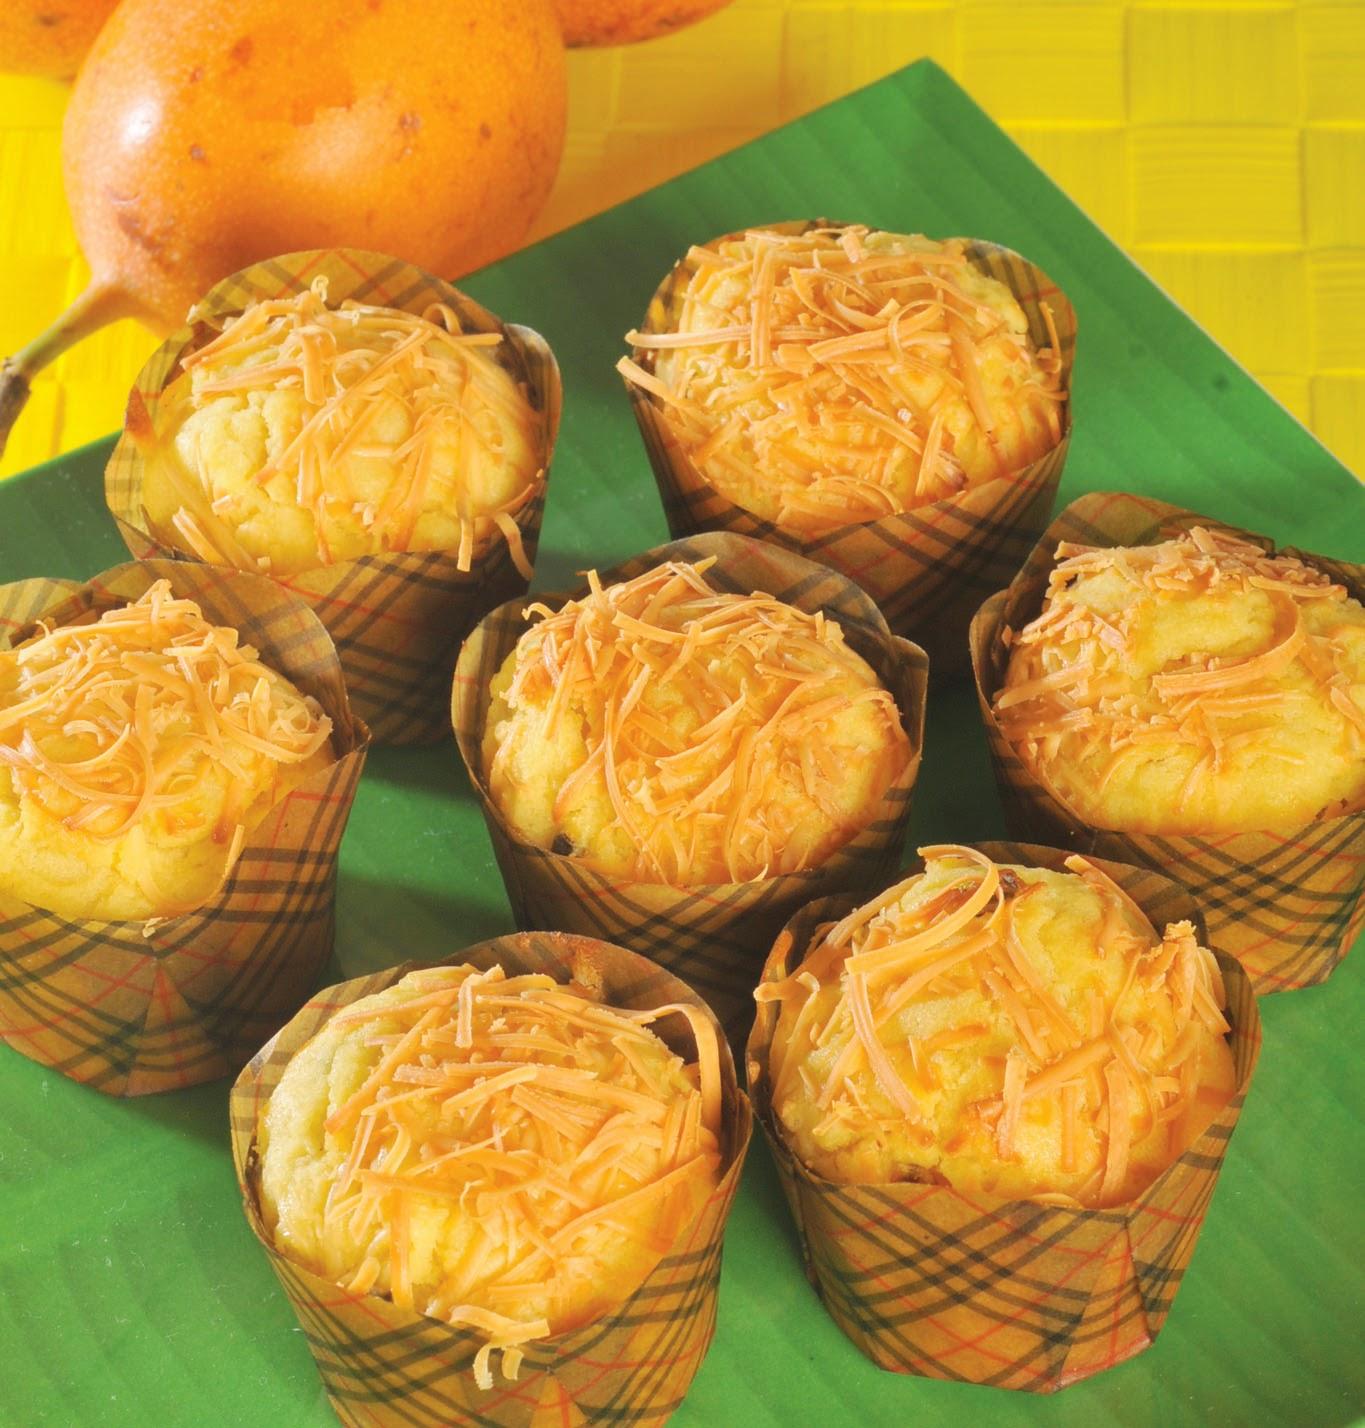 ... Cupcake Cantik Ciricara Cara Membuat Terasa Enak Cake on Pinterest